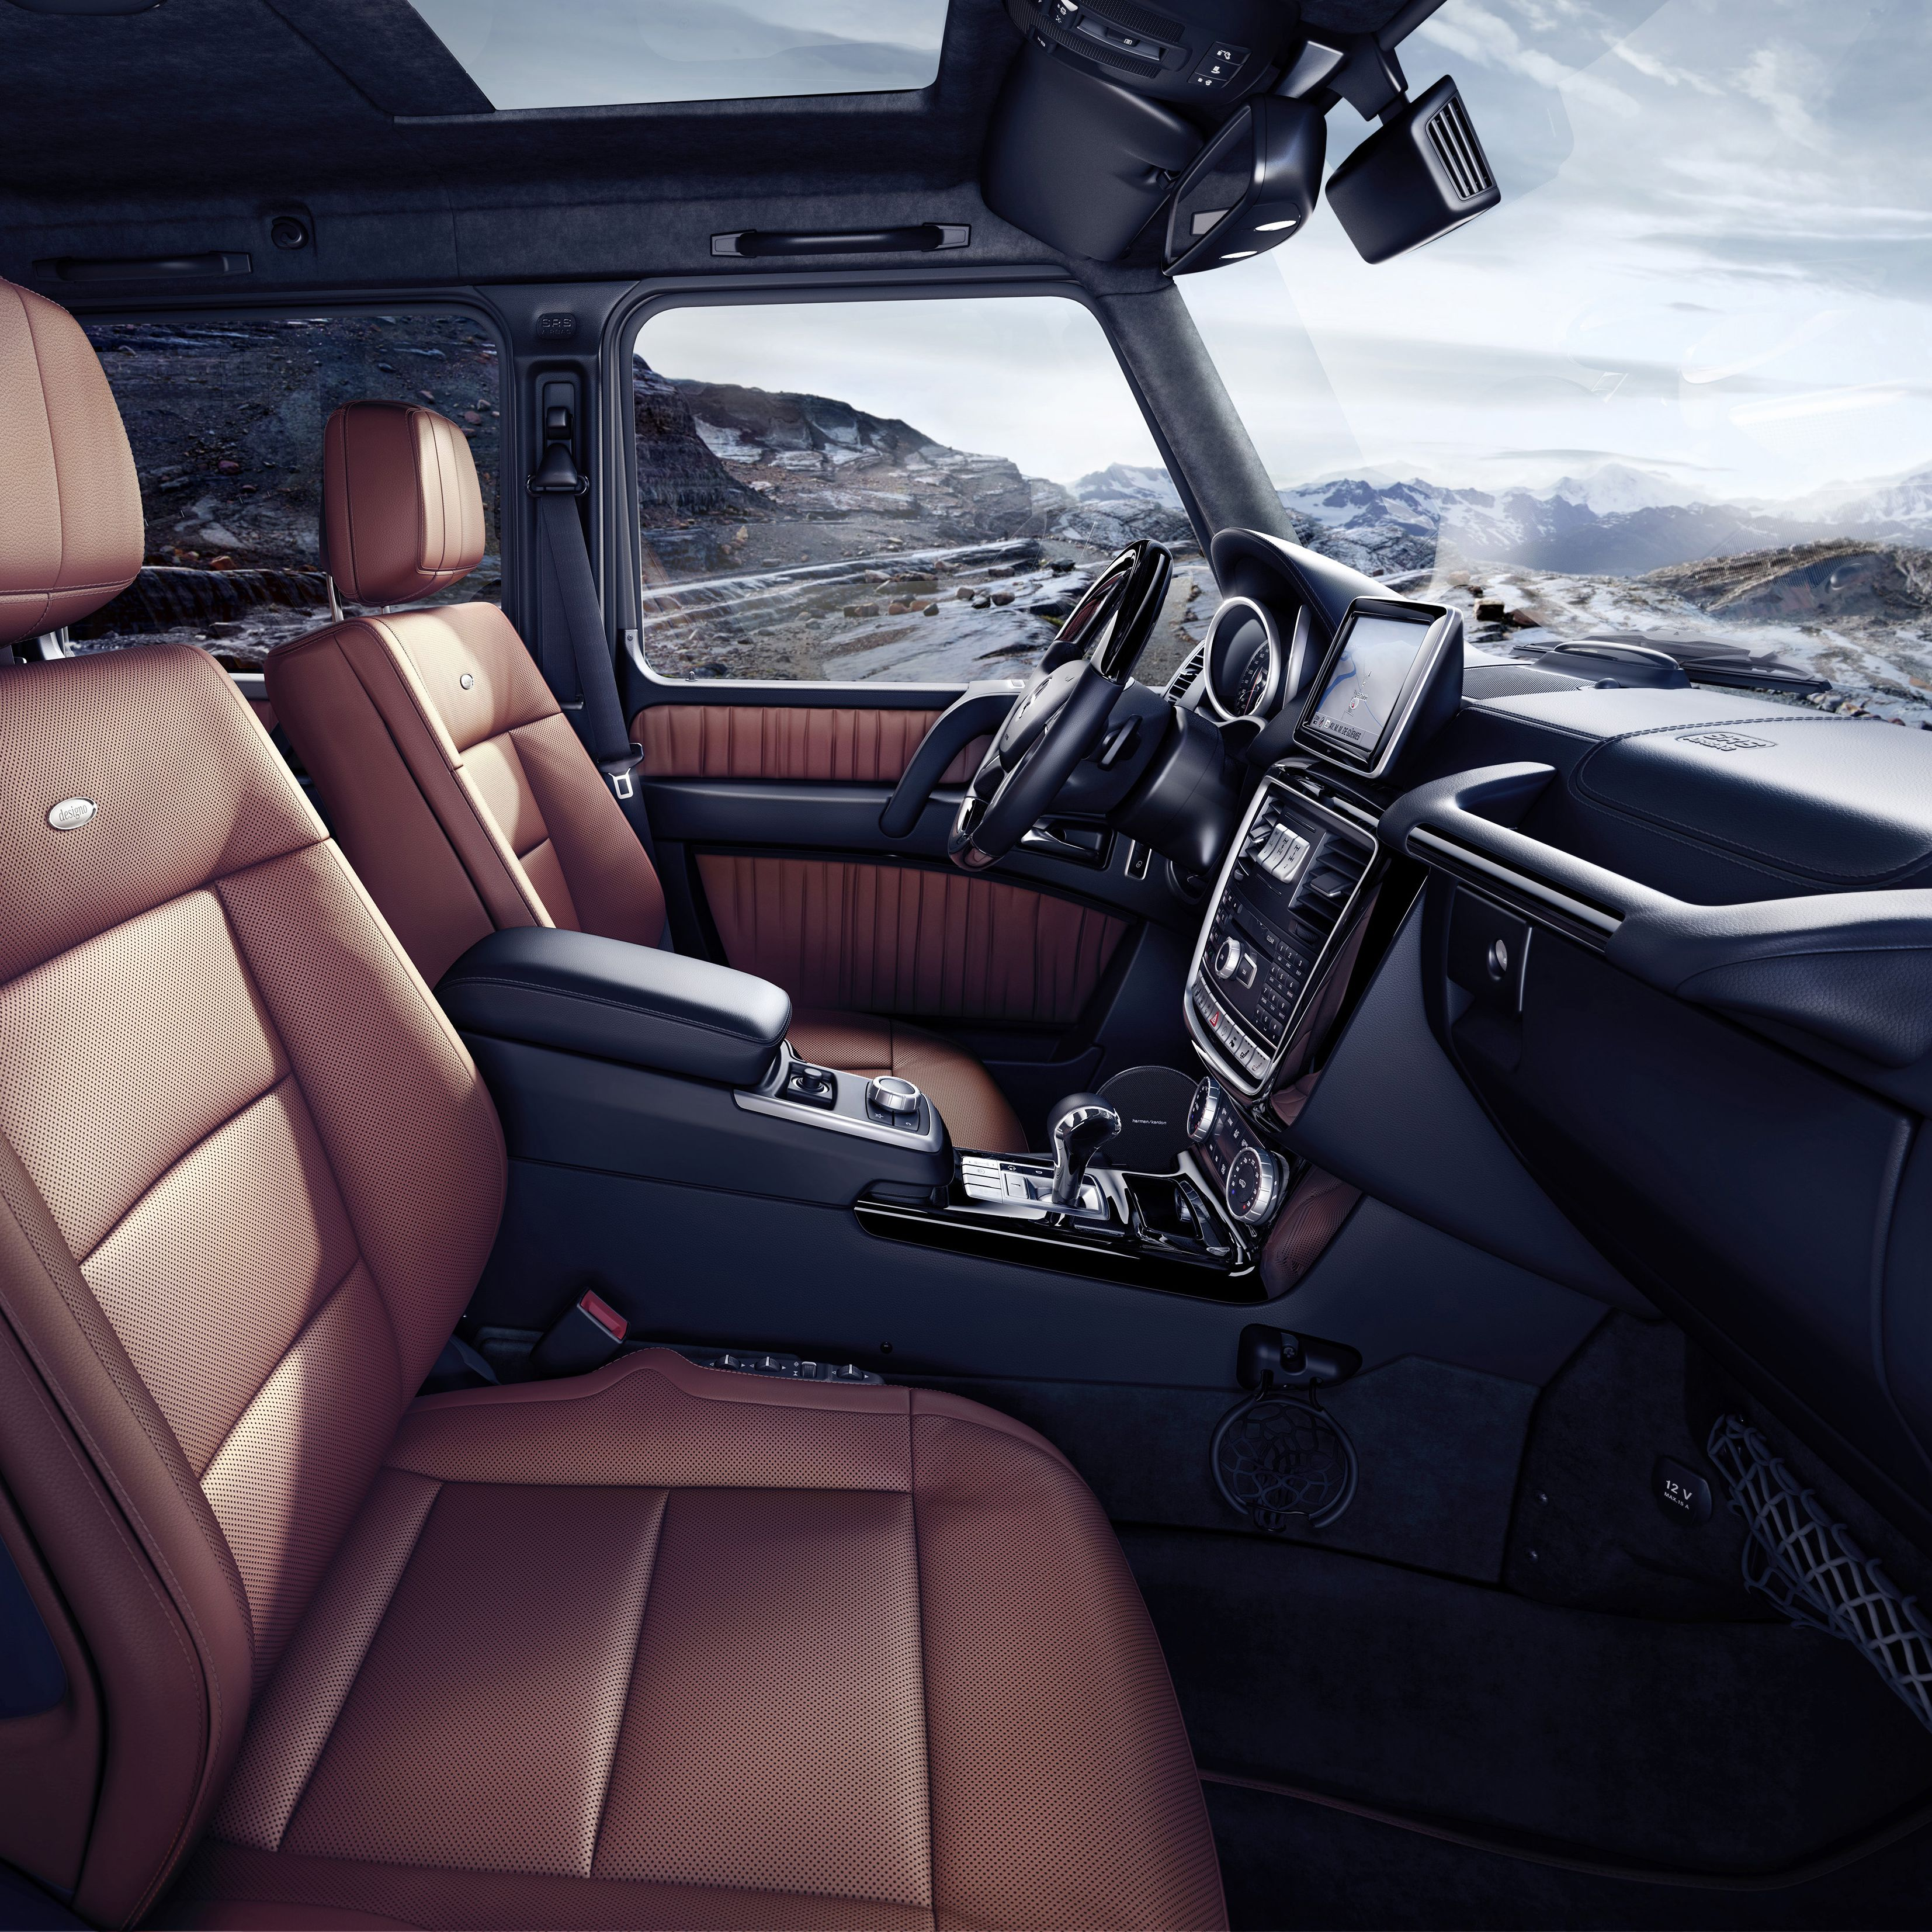 Mercedes-Benz G-Class (BR 463) 2015&#x3B; G 500&#xA&#x3B;Interieur: designo Nappaleder hellbraun&#xA&#x3B;interior: designo nappa leather light brown